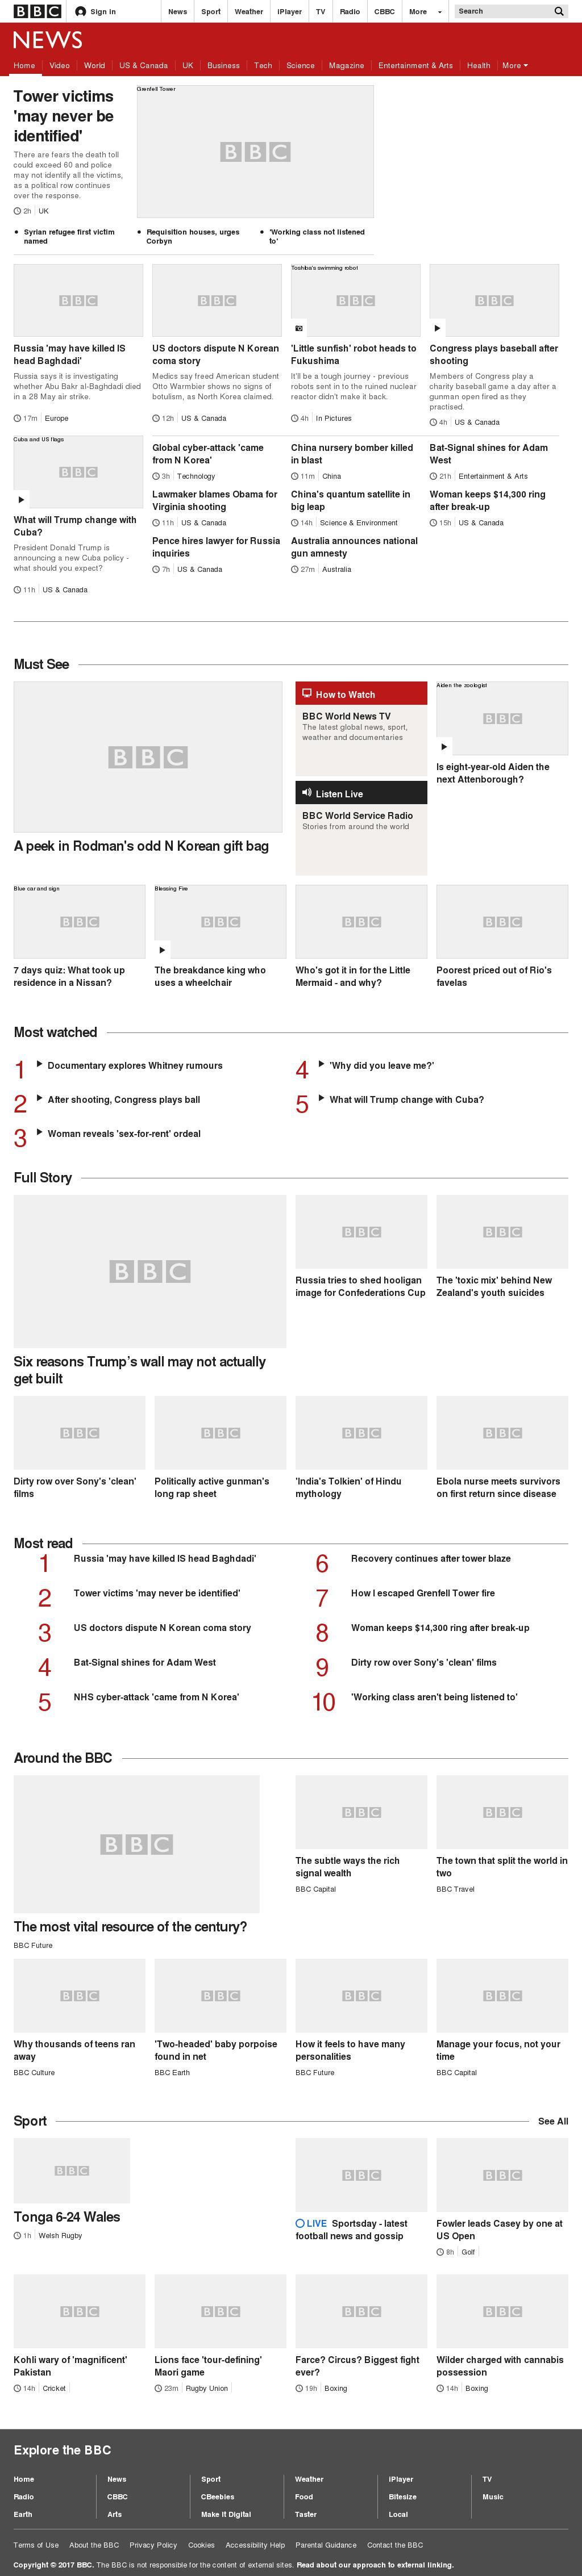 BBC at Friday June 16, 2017, 9 a.m. UTC